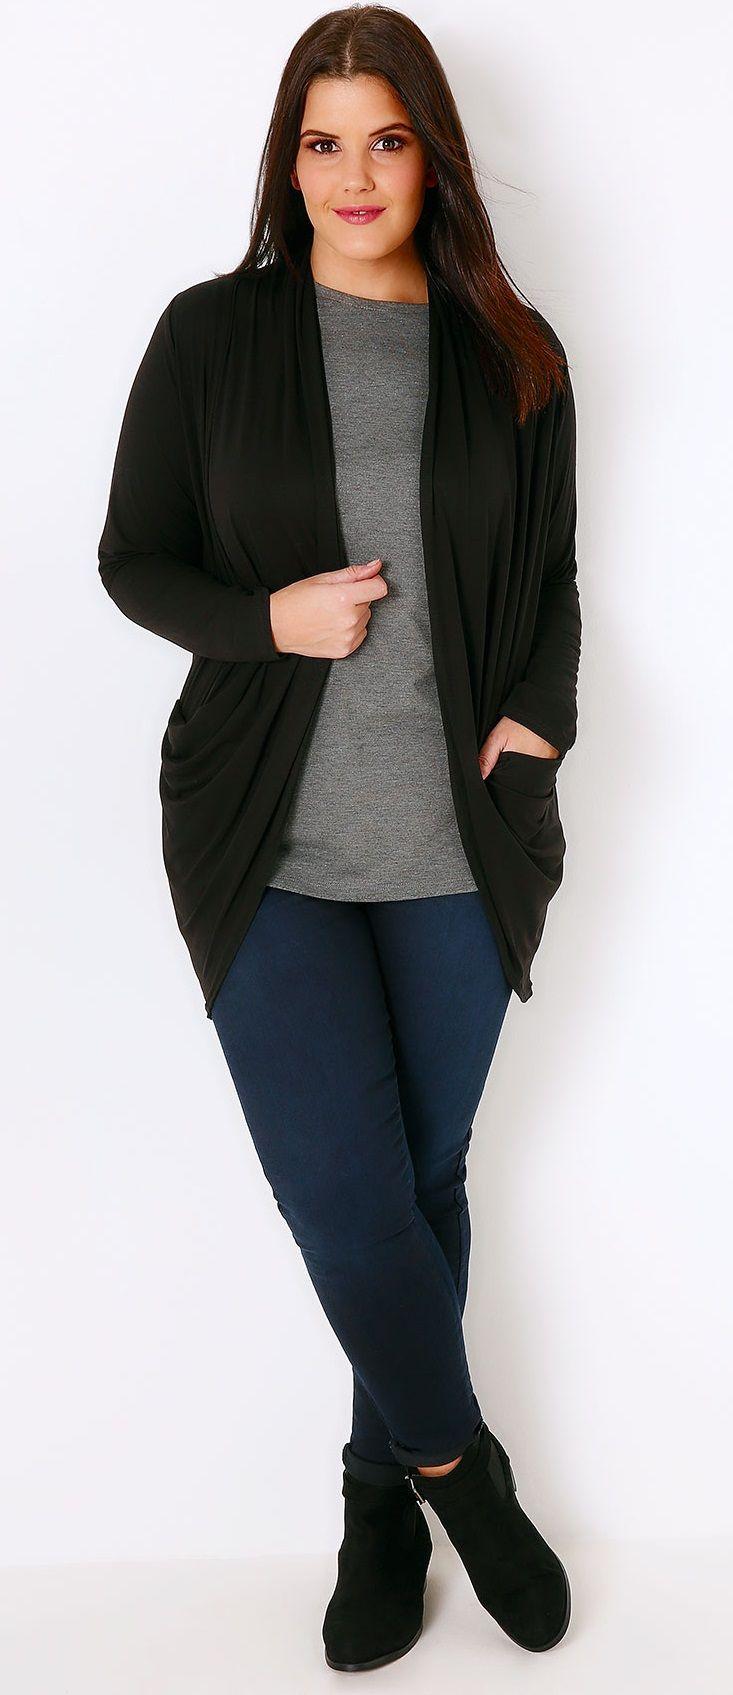 Best 25 Plus sizes fashion ideas on Pinterest  Casual curvy fashion Plus fashion and